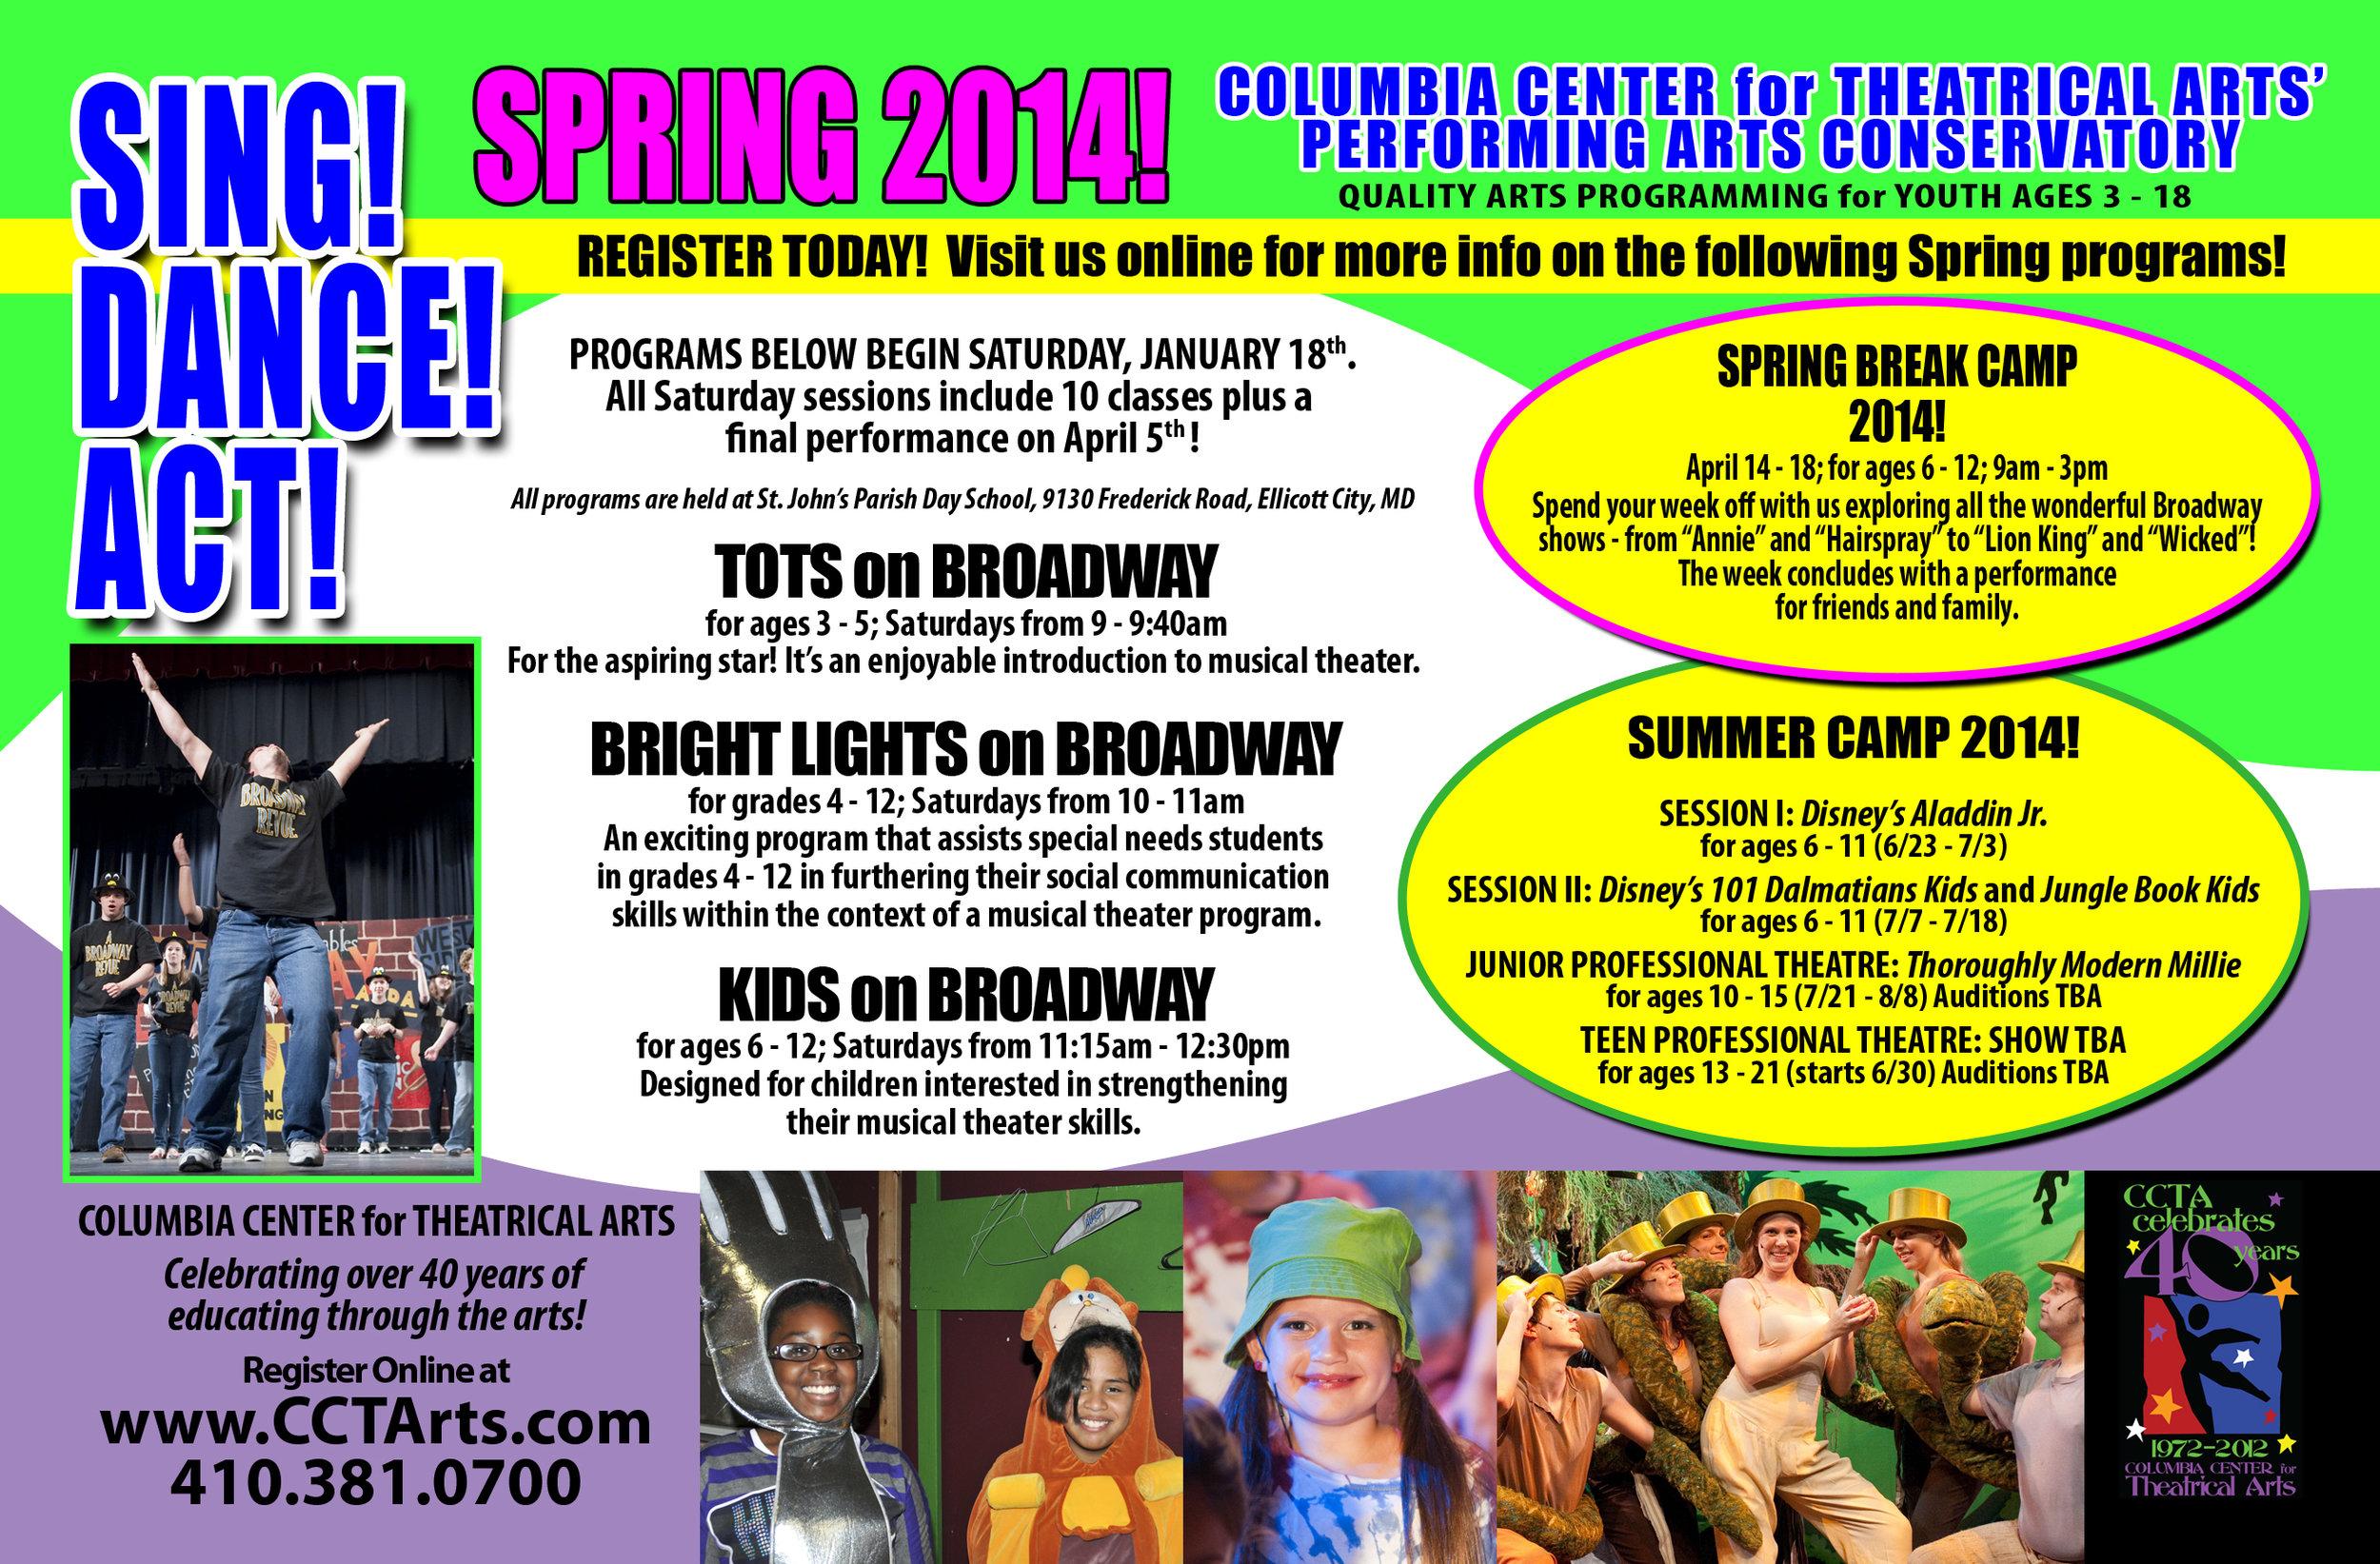 Postcard - Spring 2014 CCTA Conservatory Programs FINAL 875 x 575 copy.jpg